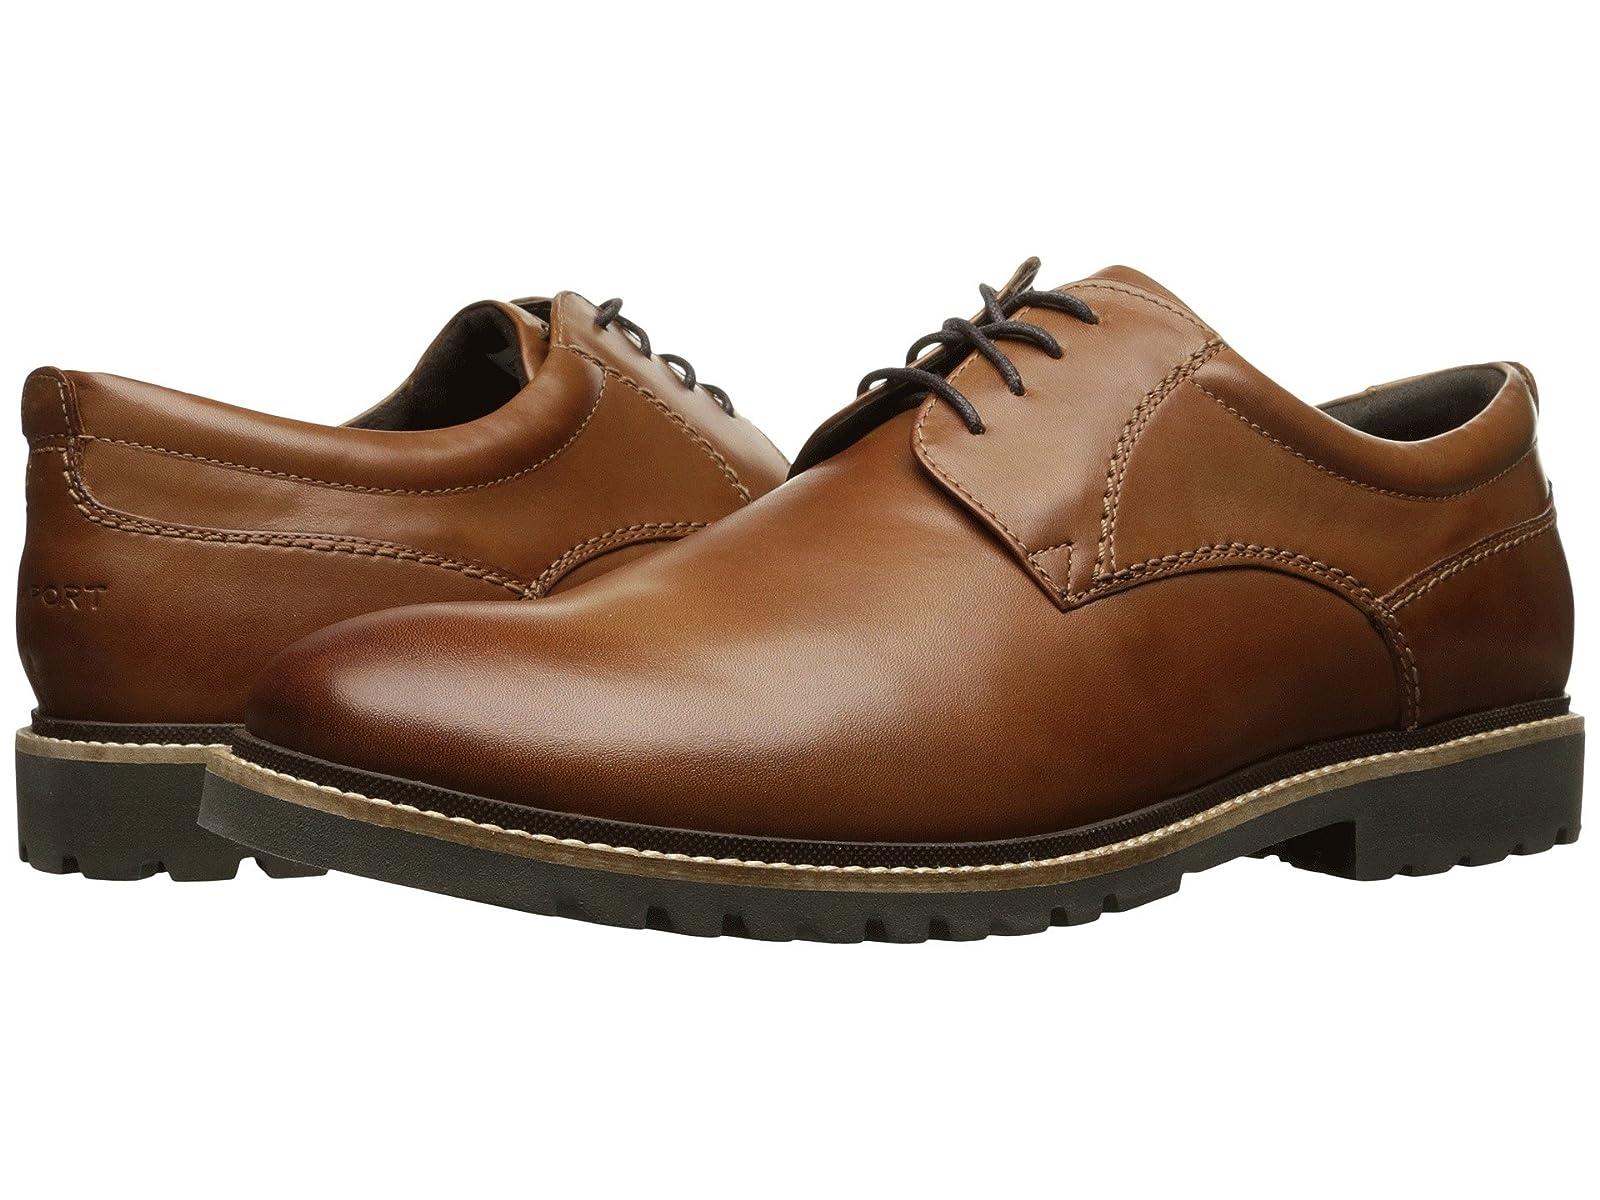 Rockport Marshall Plain Toe OxfordAtmospheric grades have affordable shoes